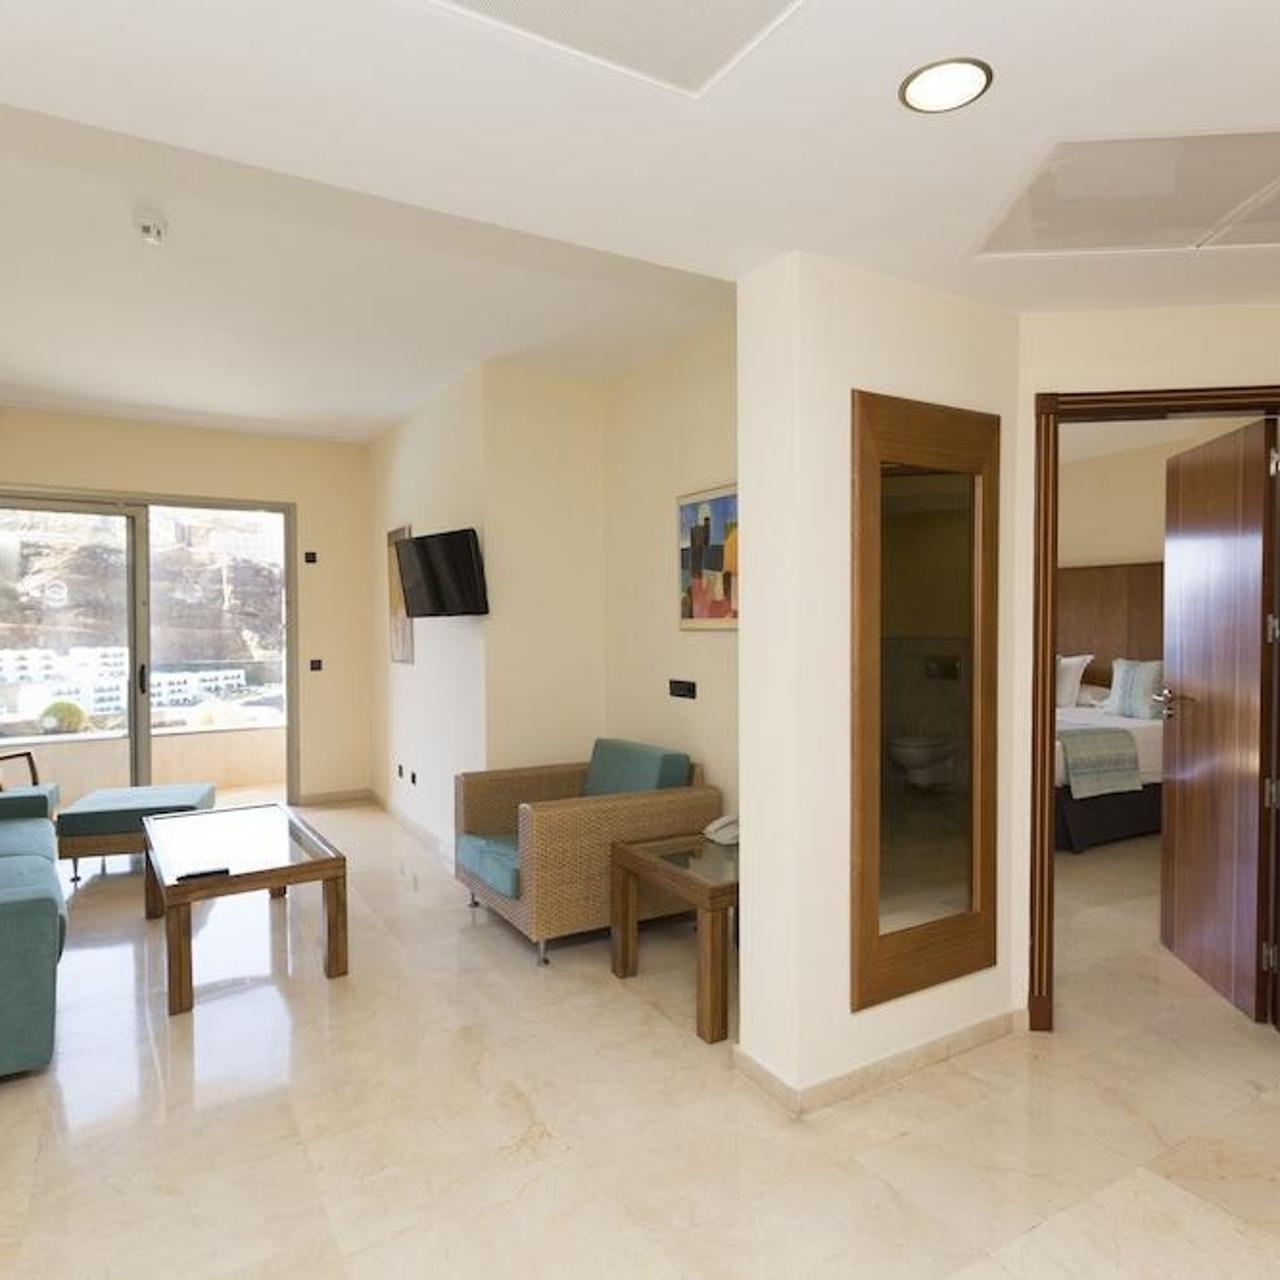 Gloria Palace Royal Hotel Spa 4 Hrs Star Hotel In Gran Canaria Canary Islands